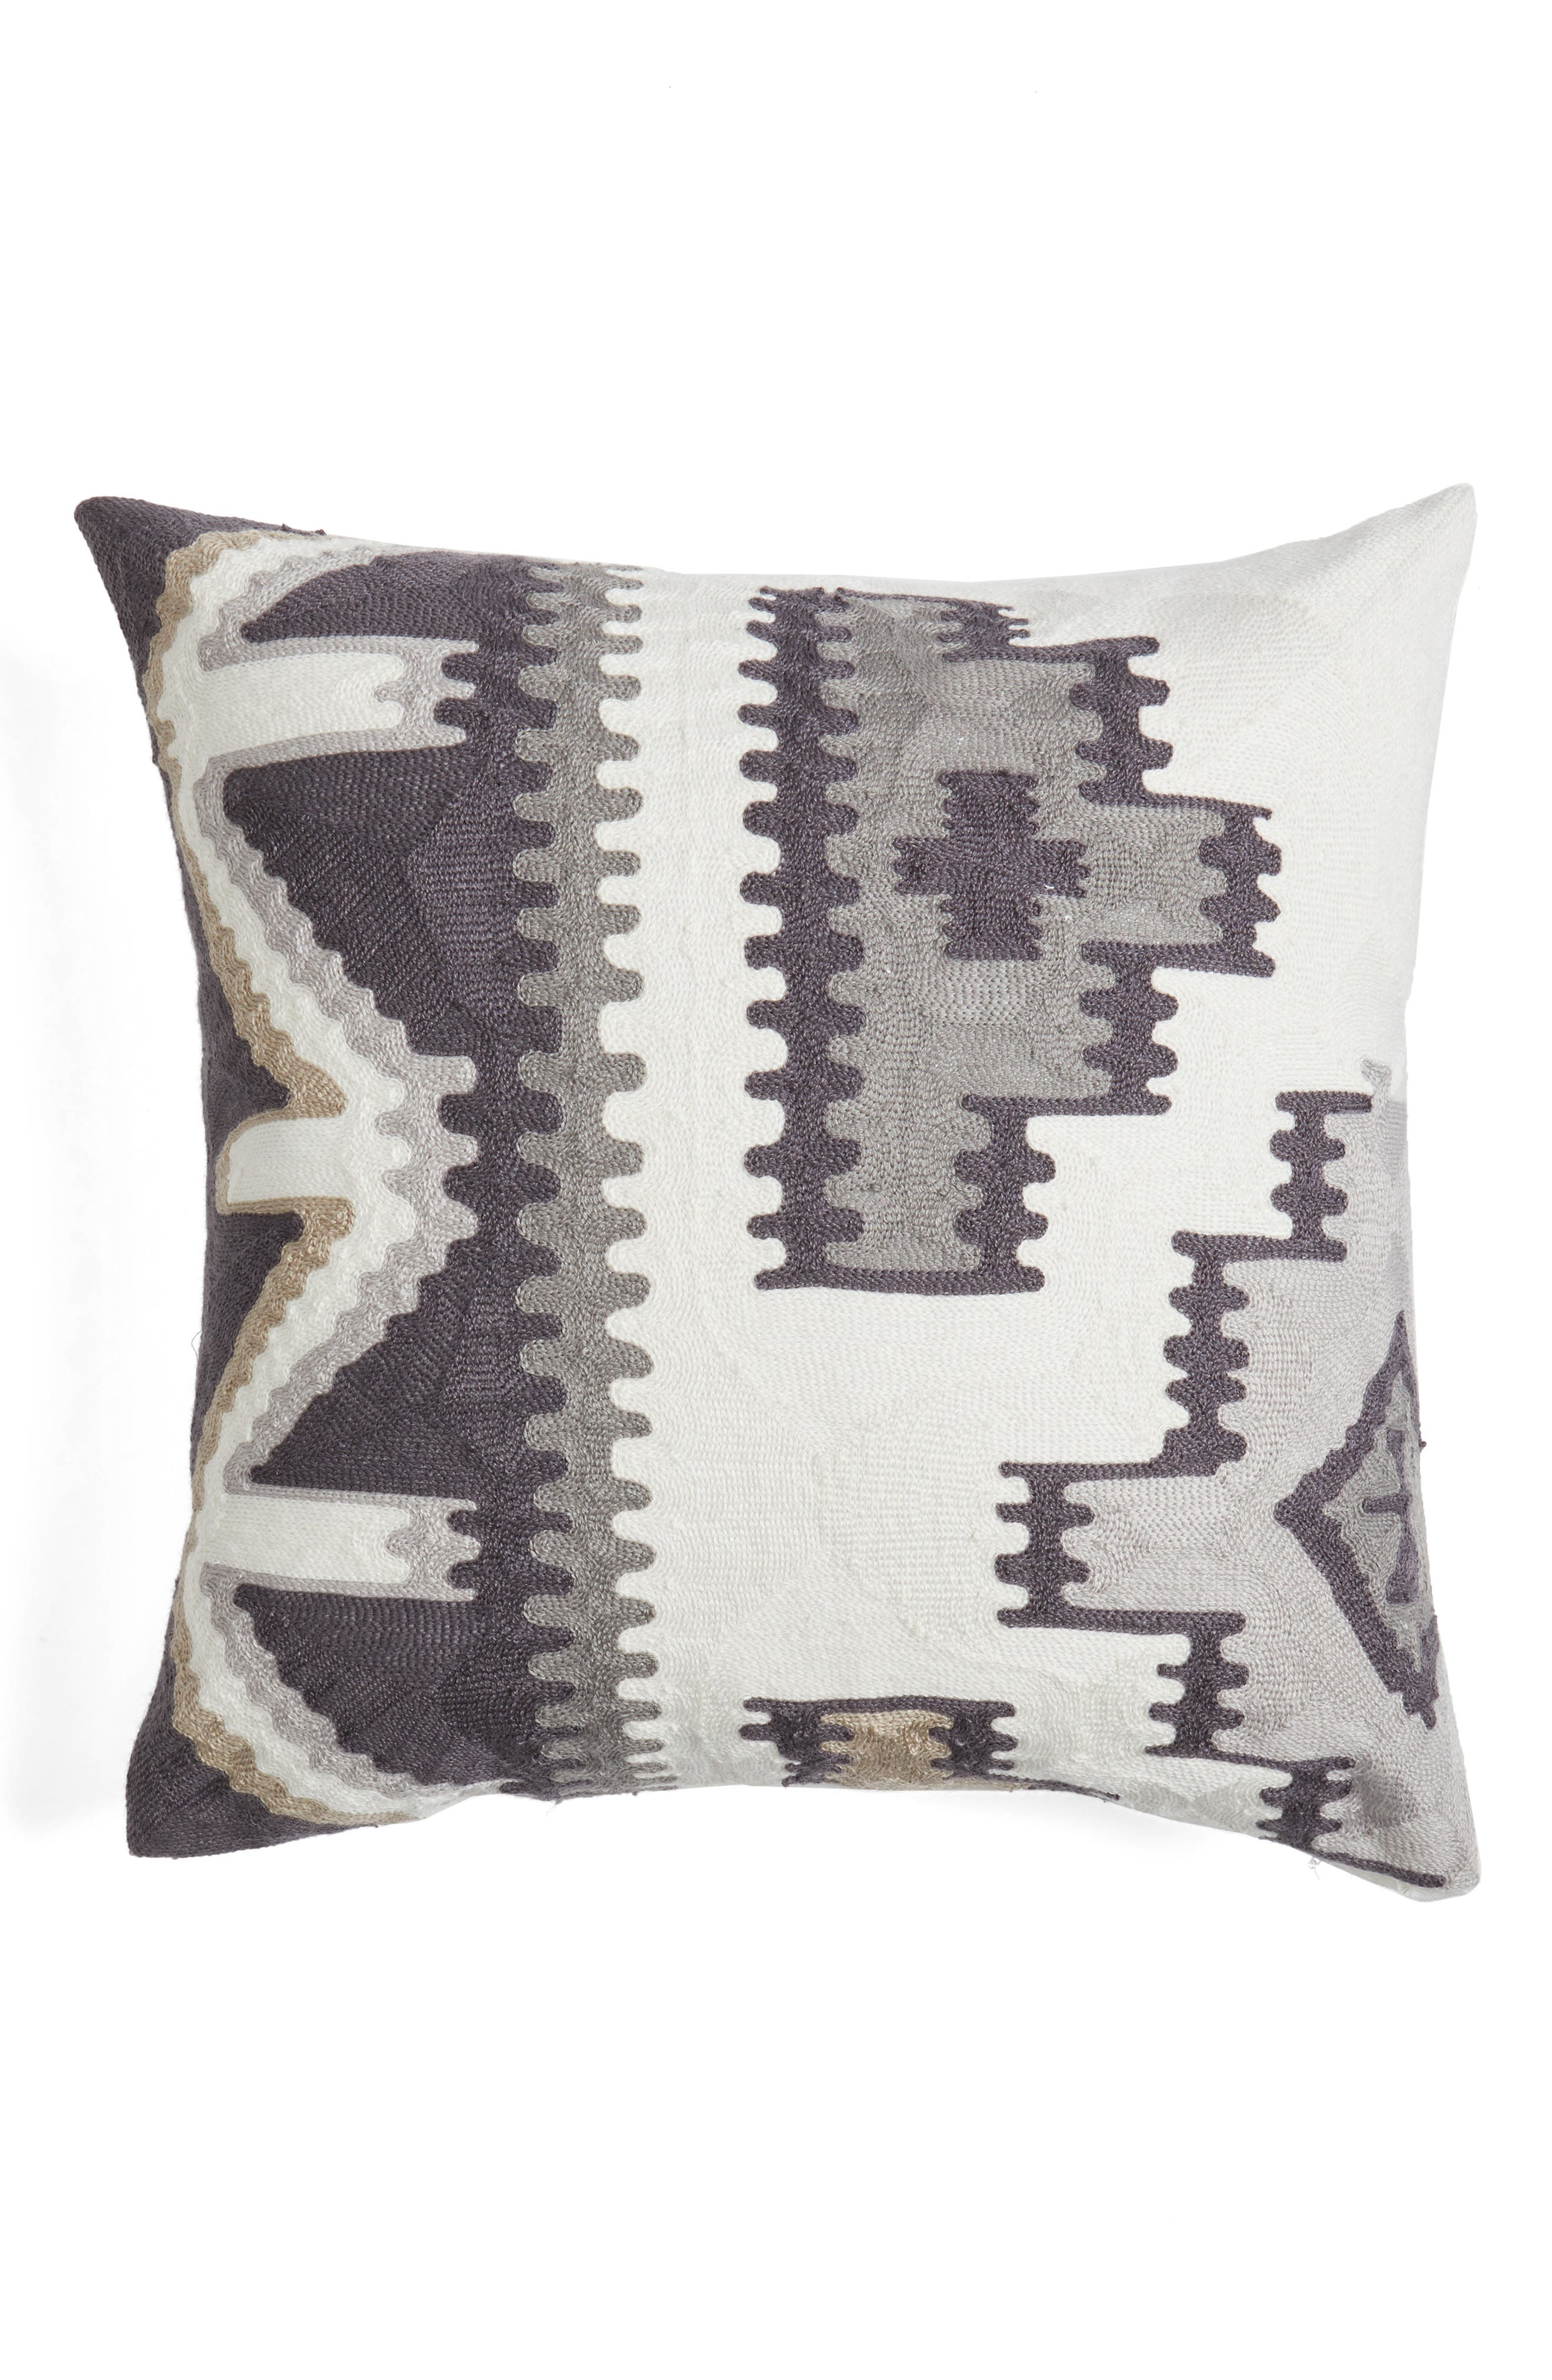 Matmi Towel Stitch Accent Pillow,                         Main,                         color, Grey